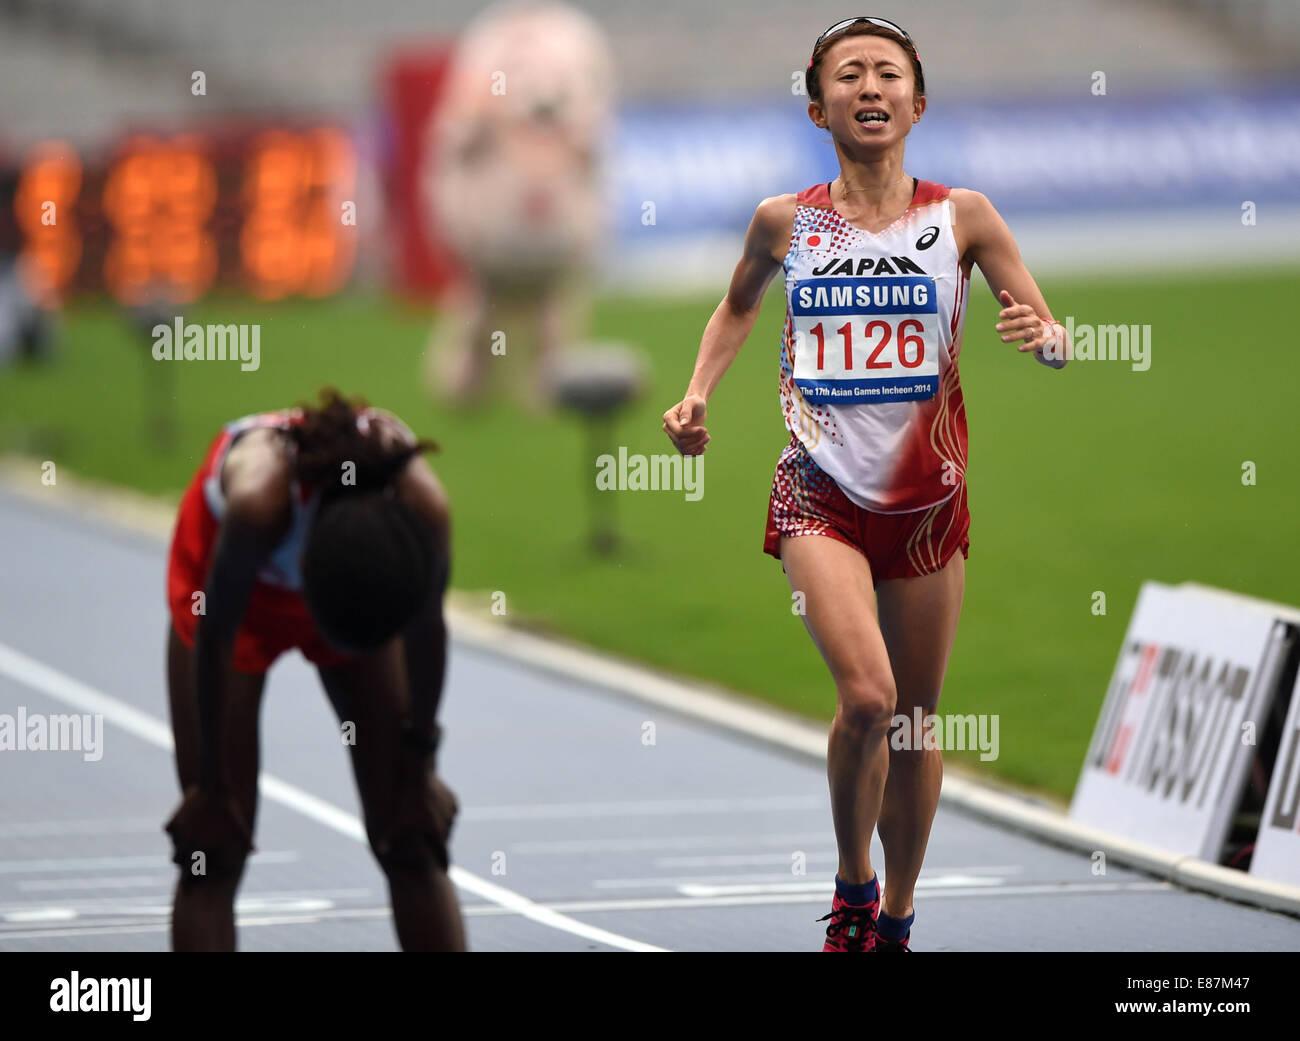 Incheon, South Korea. 2nd Oct, 2014. Kizaki Ryoko (R) of Japan competes during the women's marathon of athletics - Stock Image